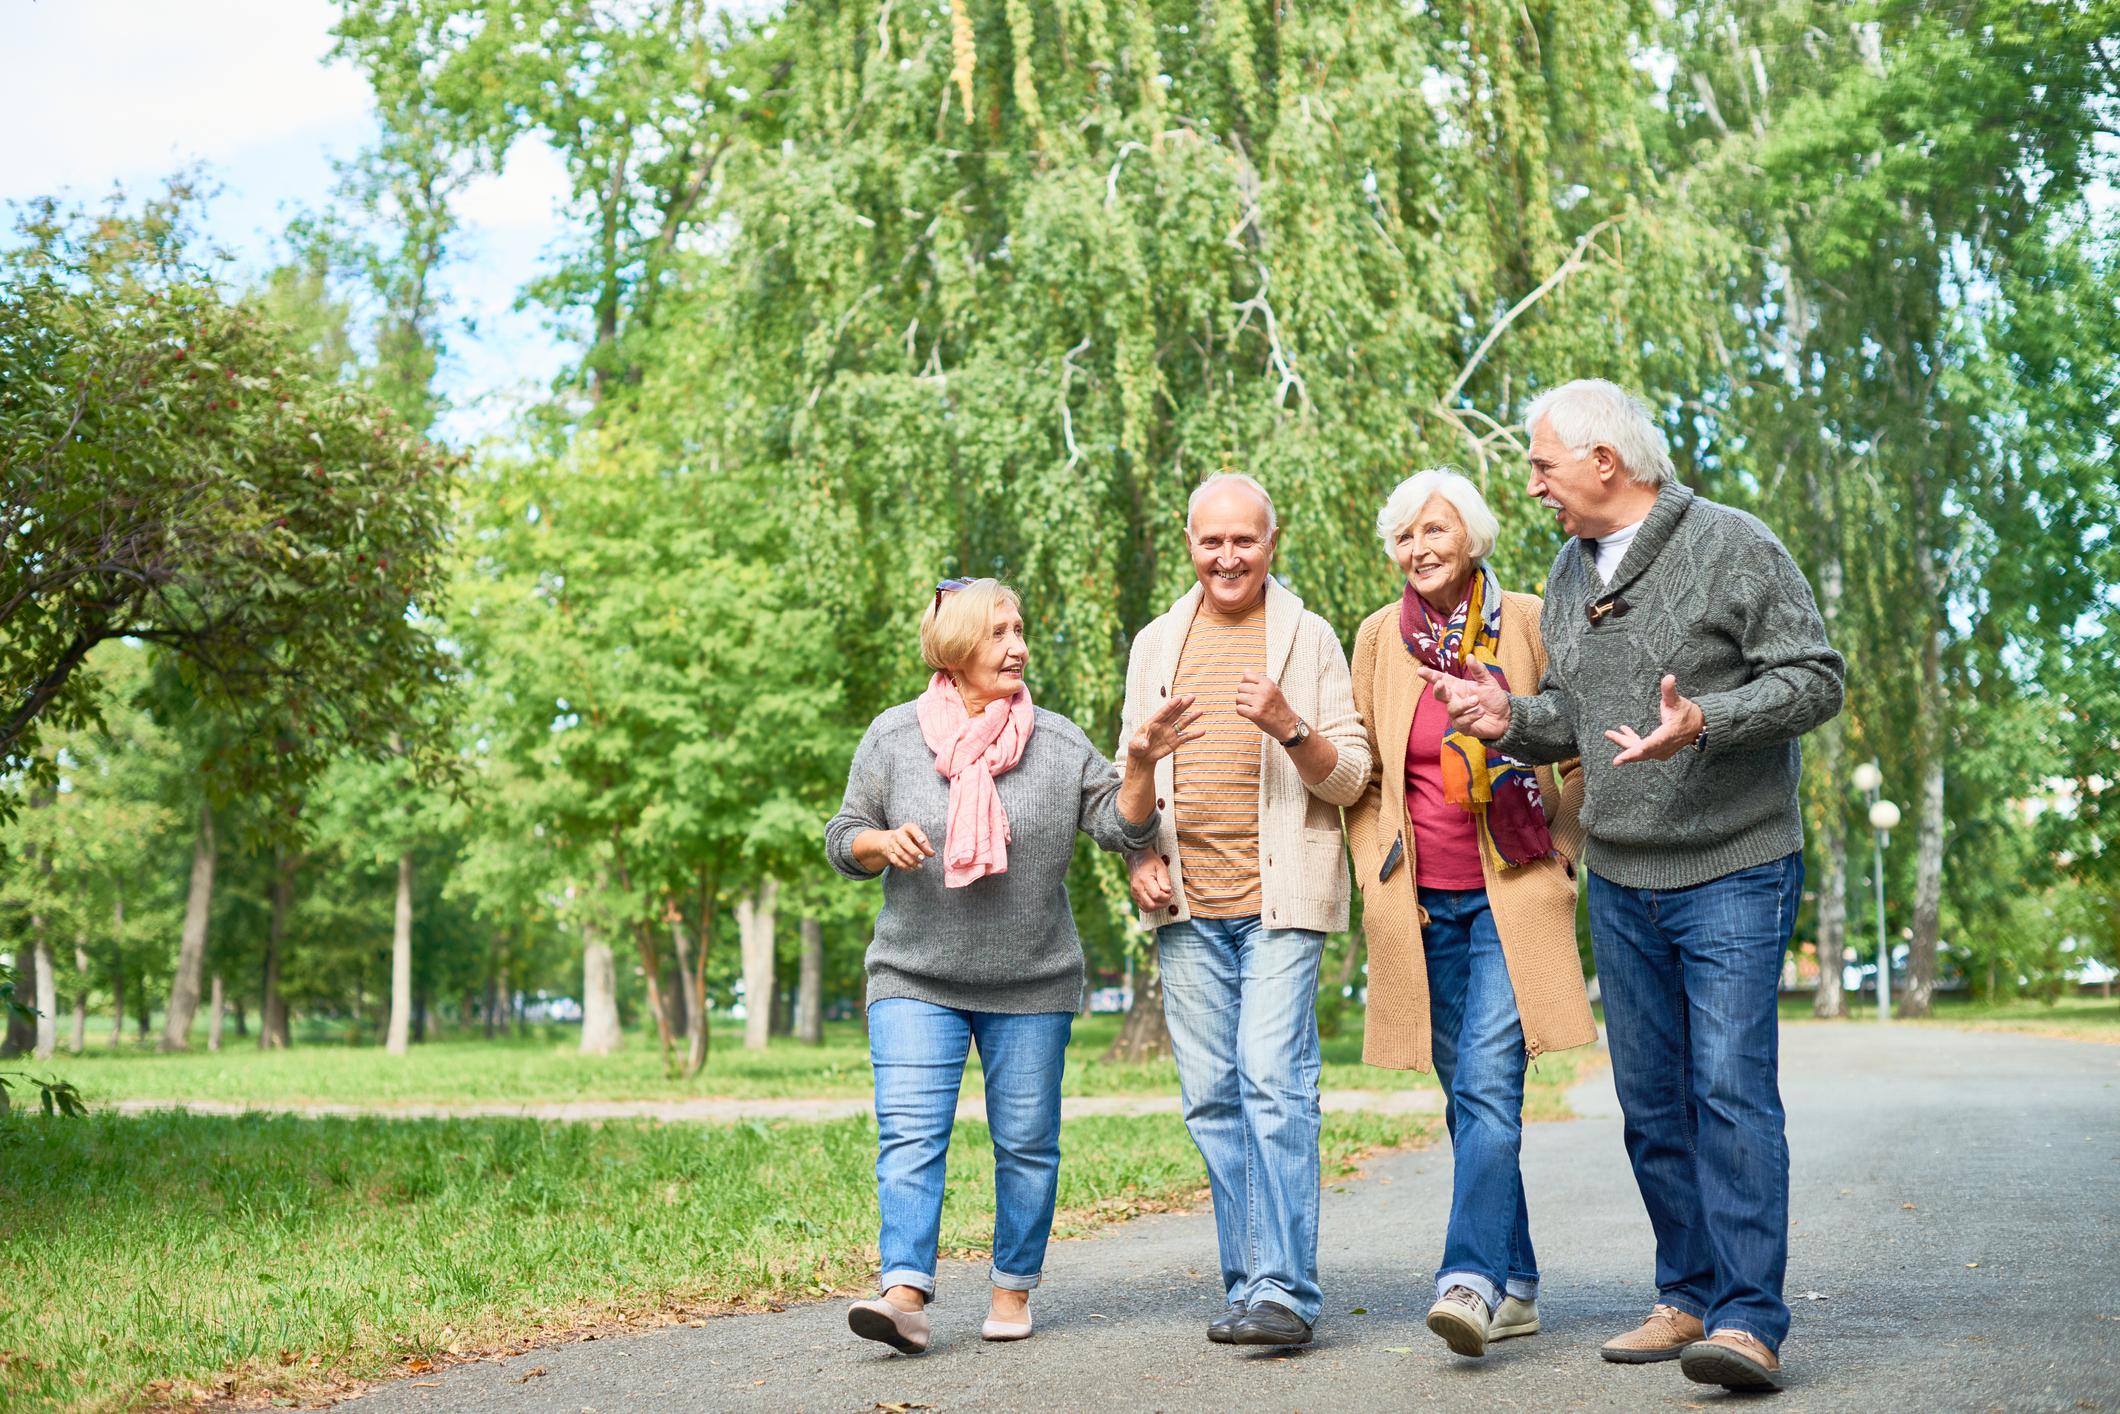 Two senior men and two senior women walking in a park